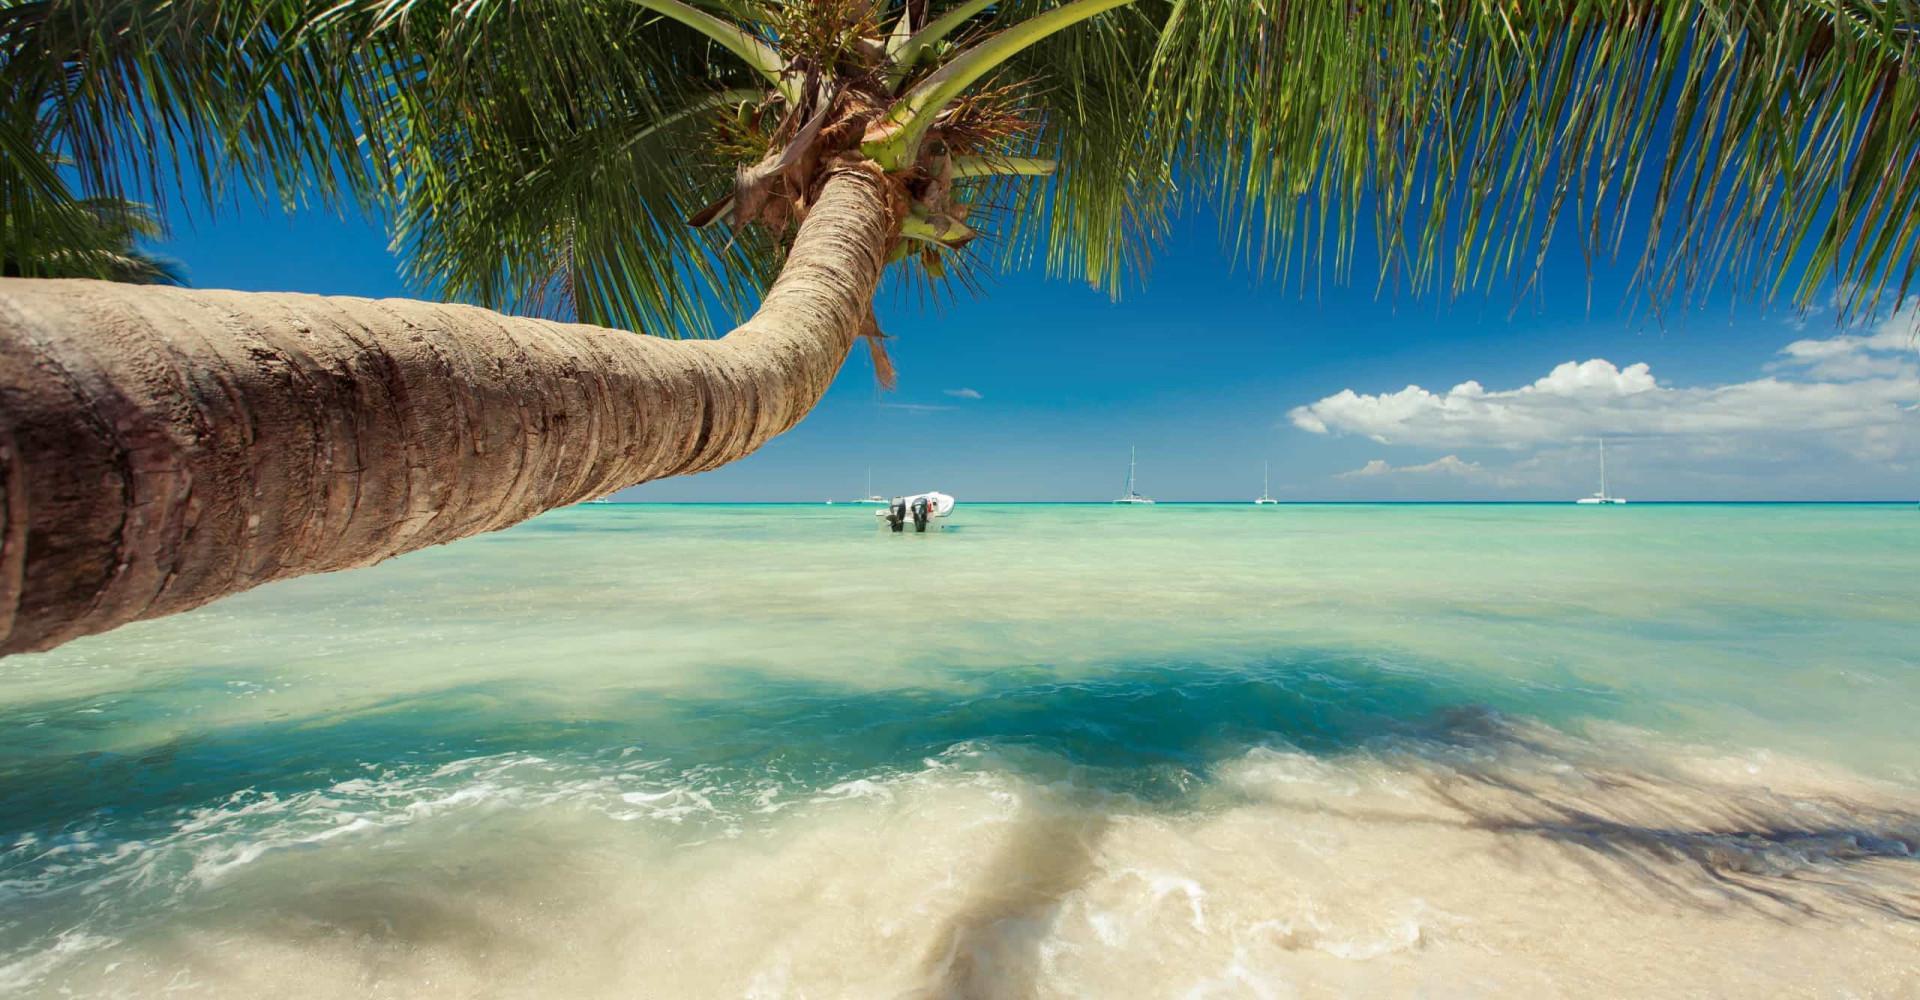 República Dominicana: A joia das Caraíbas